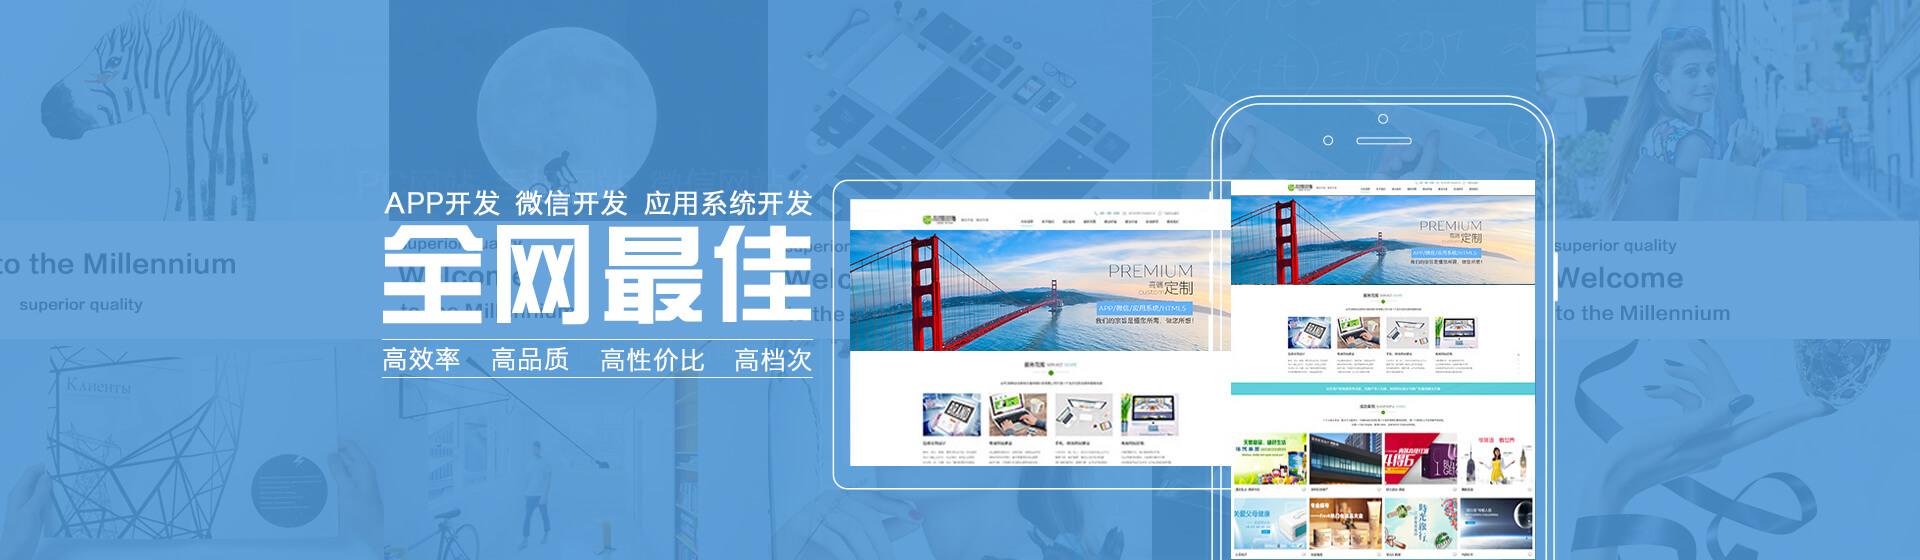 banner2 深圳网站建设公司哪家好